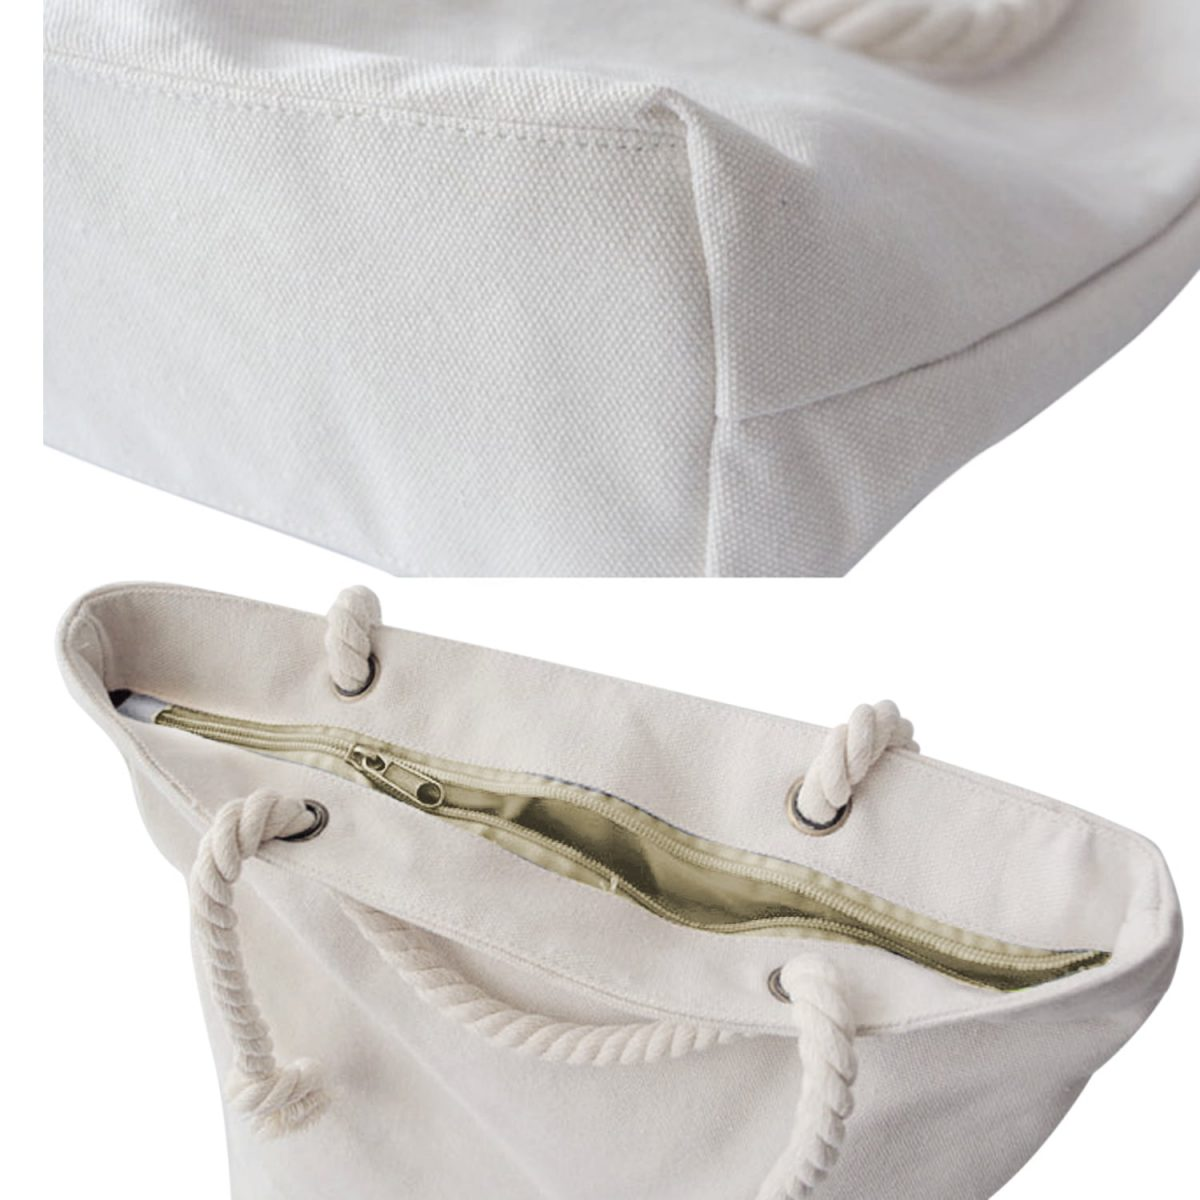 Siyah Beyaz Sütun Temalı Sümbül Motifli Fermuarlı Modern Kumaş Çanta Realhomes